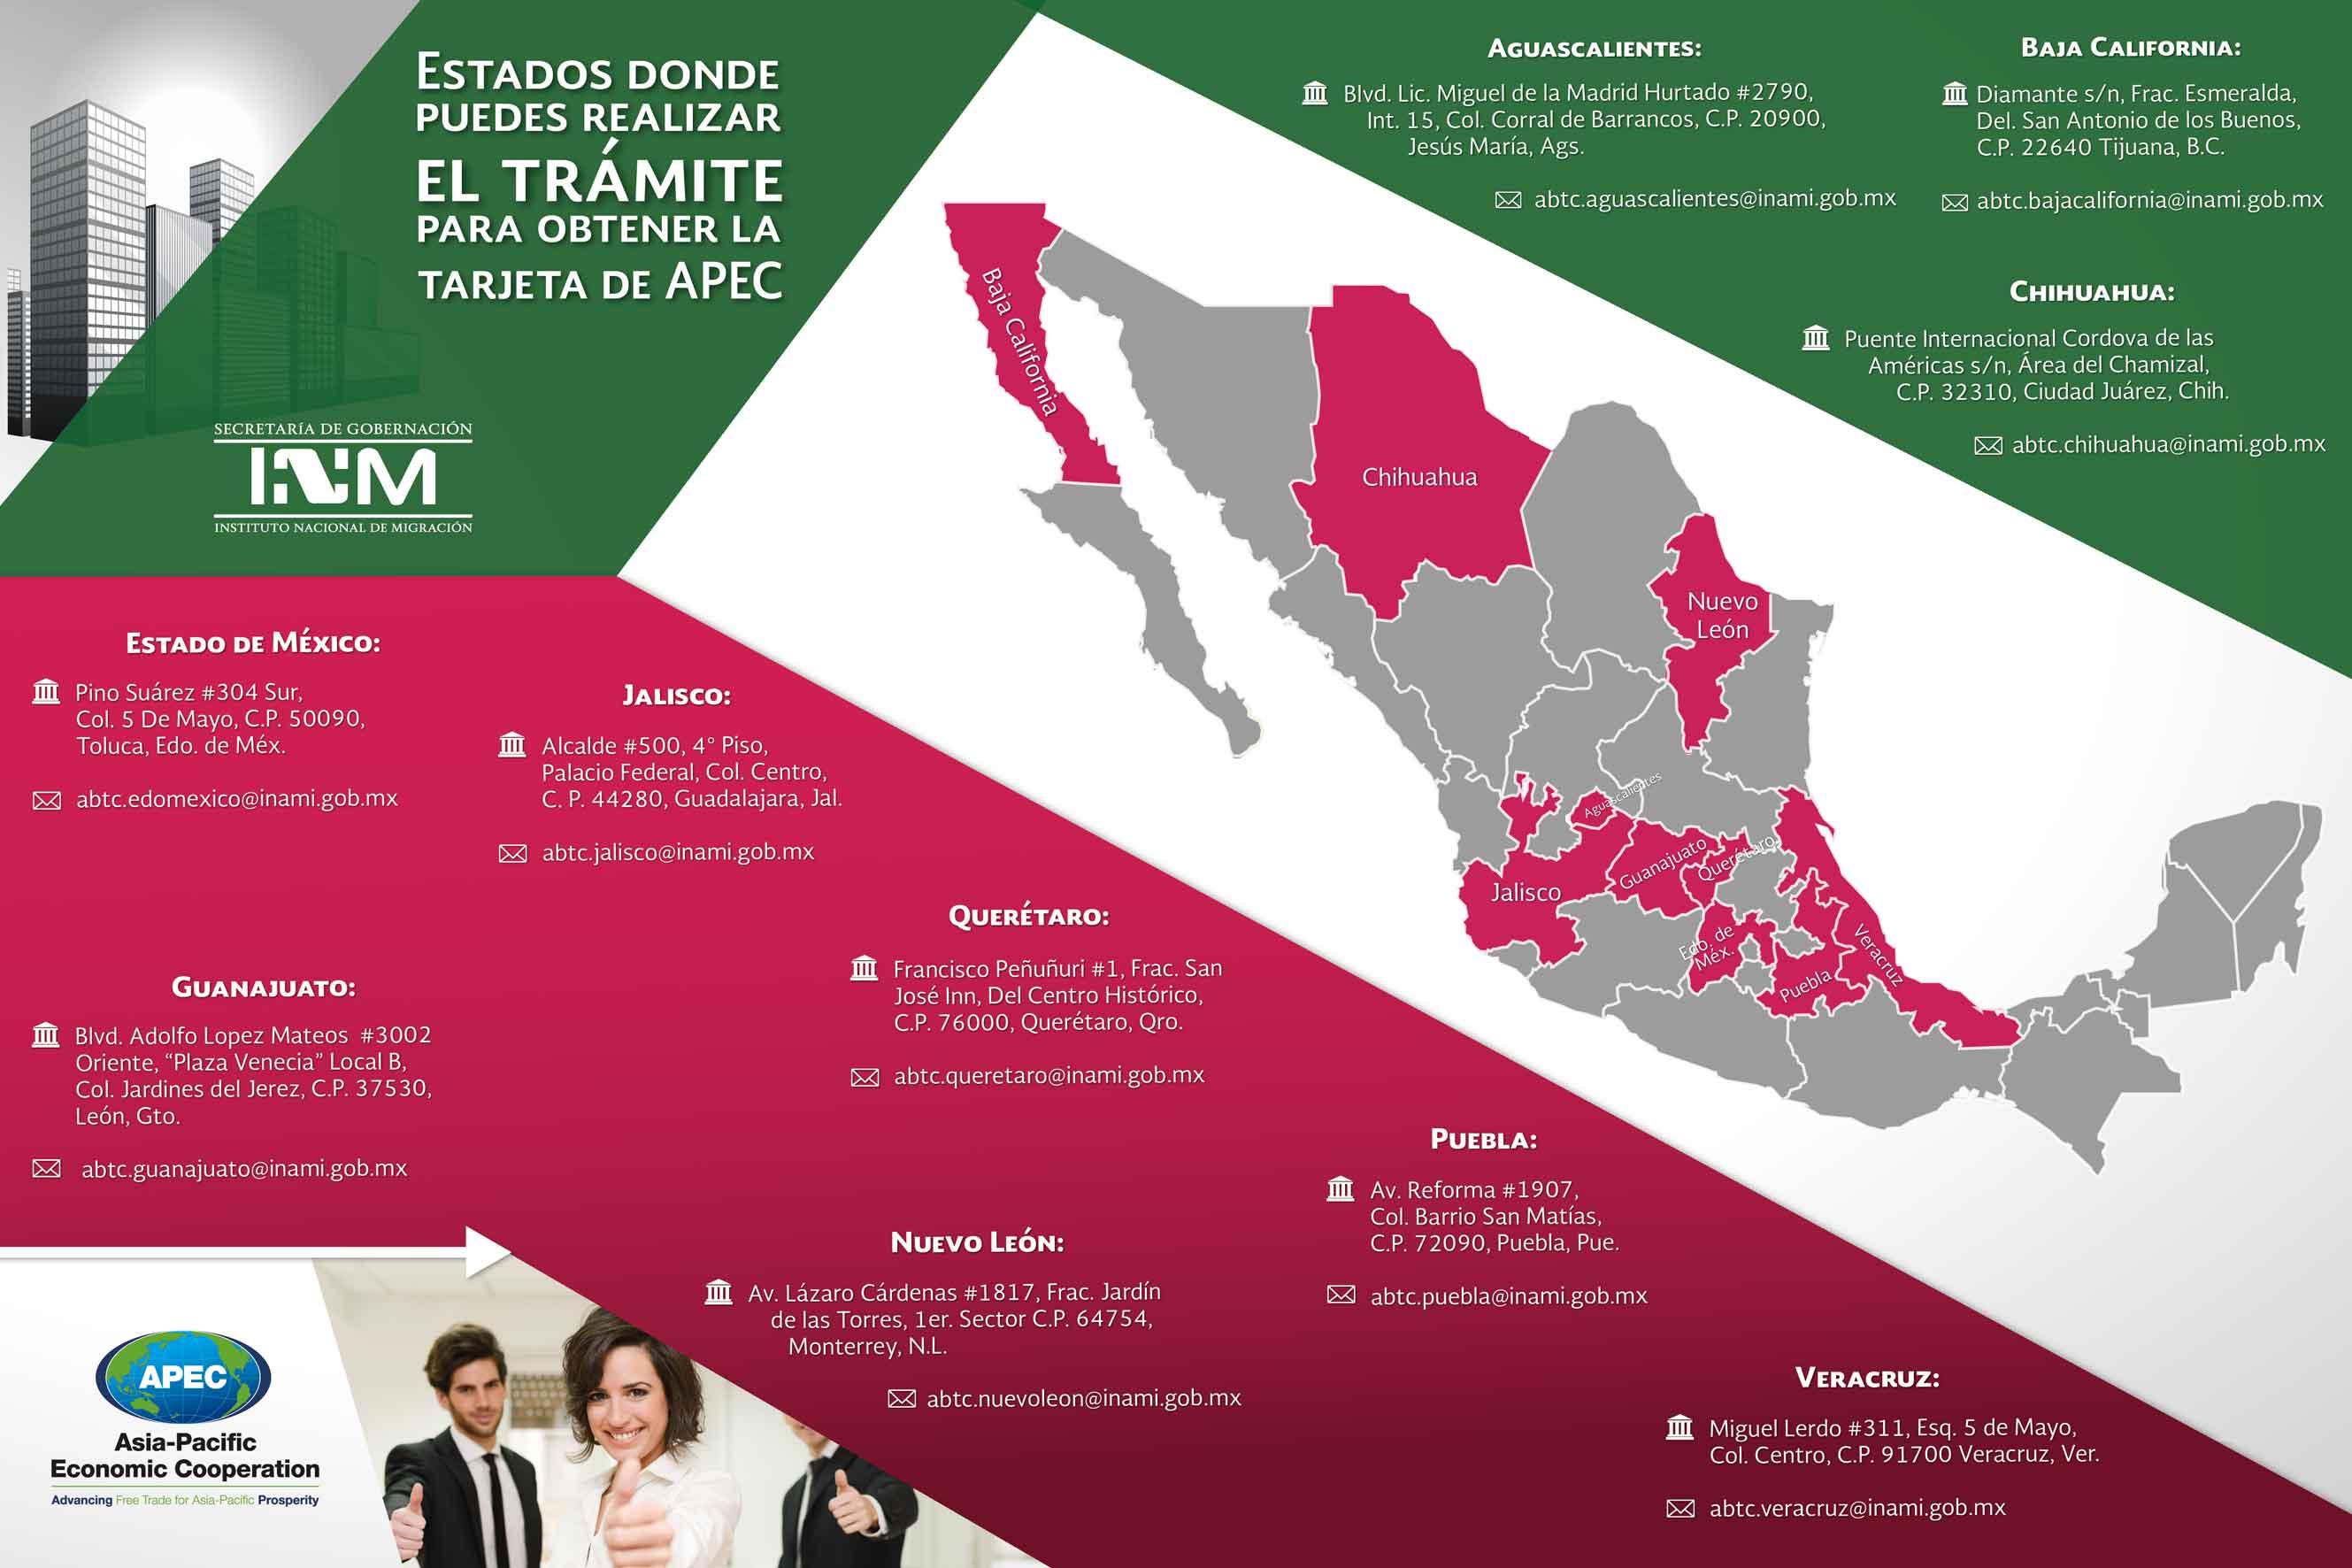 Tarjeta De Viaje De Negocios APEC Instituto Nacional De